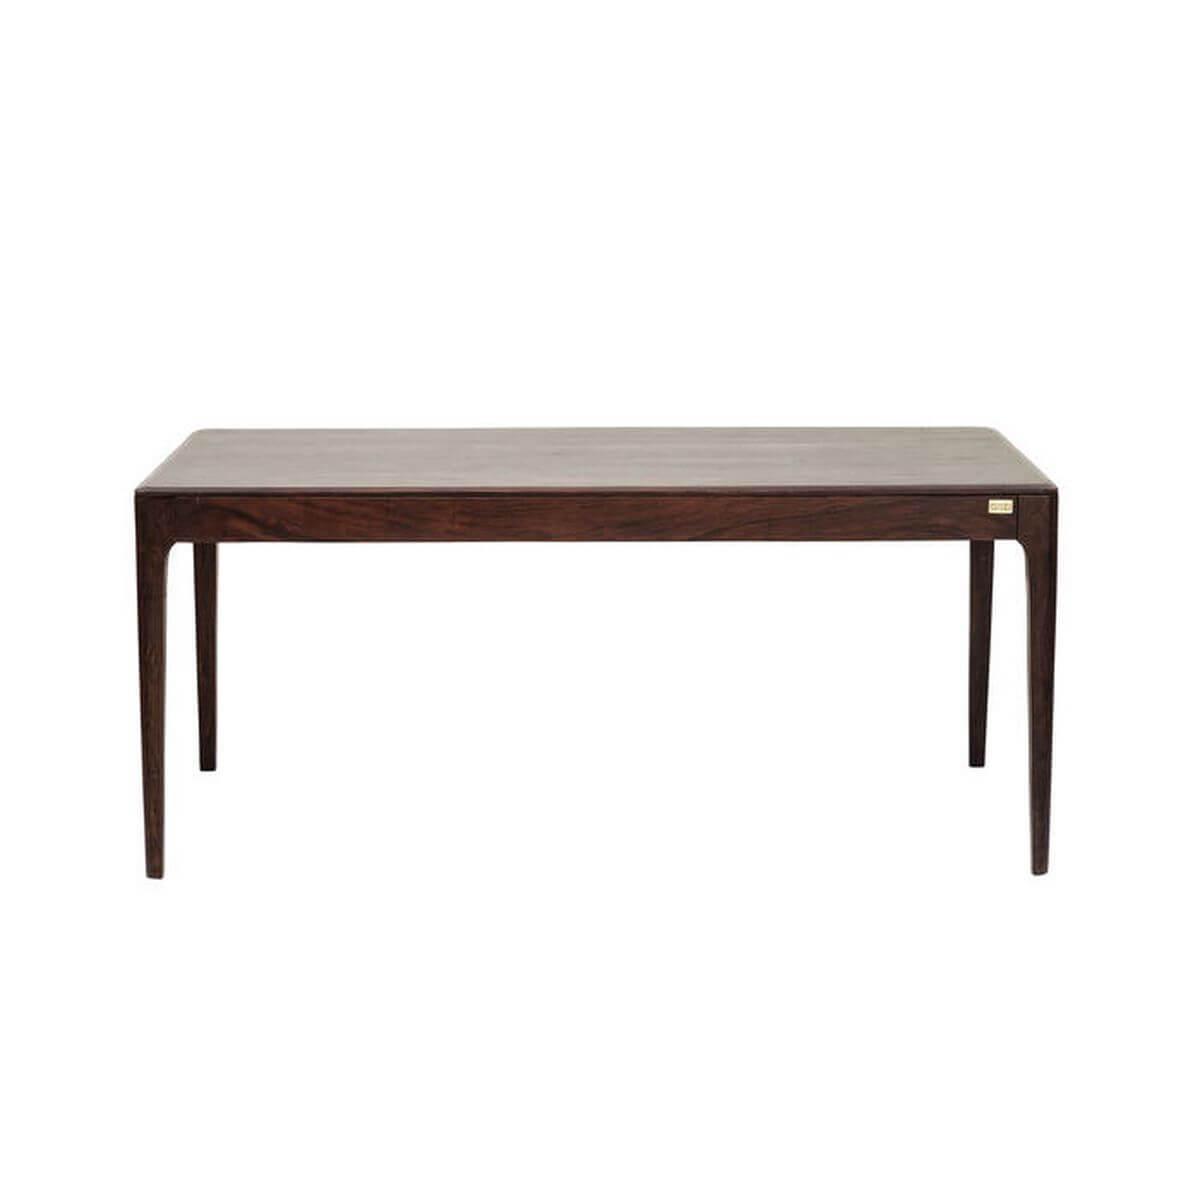 Table Brooklyn Walnut Kare Design 160x80cm